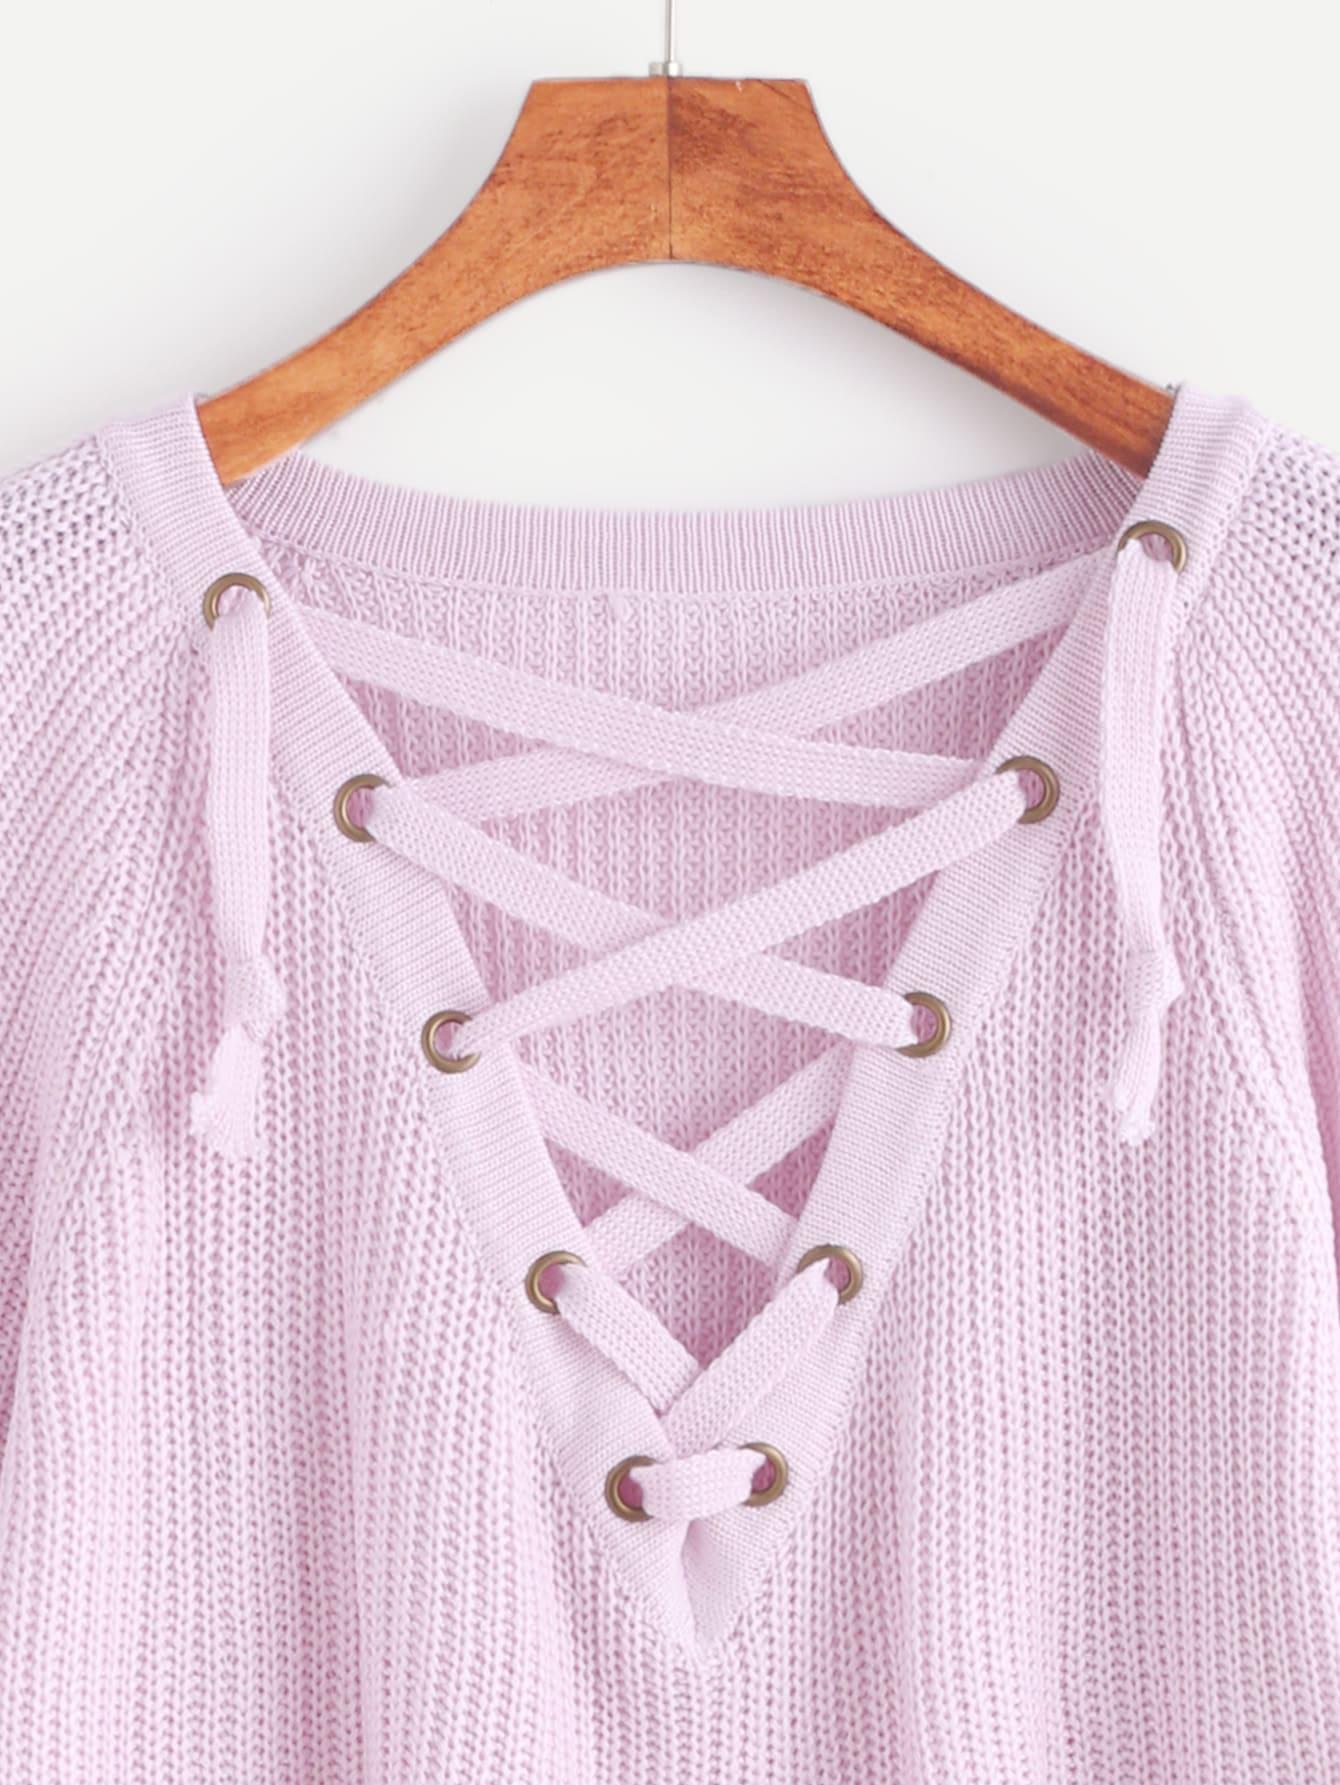 sweater161107304_2